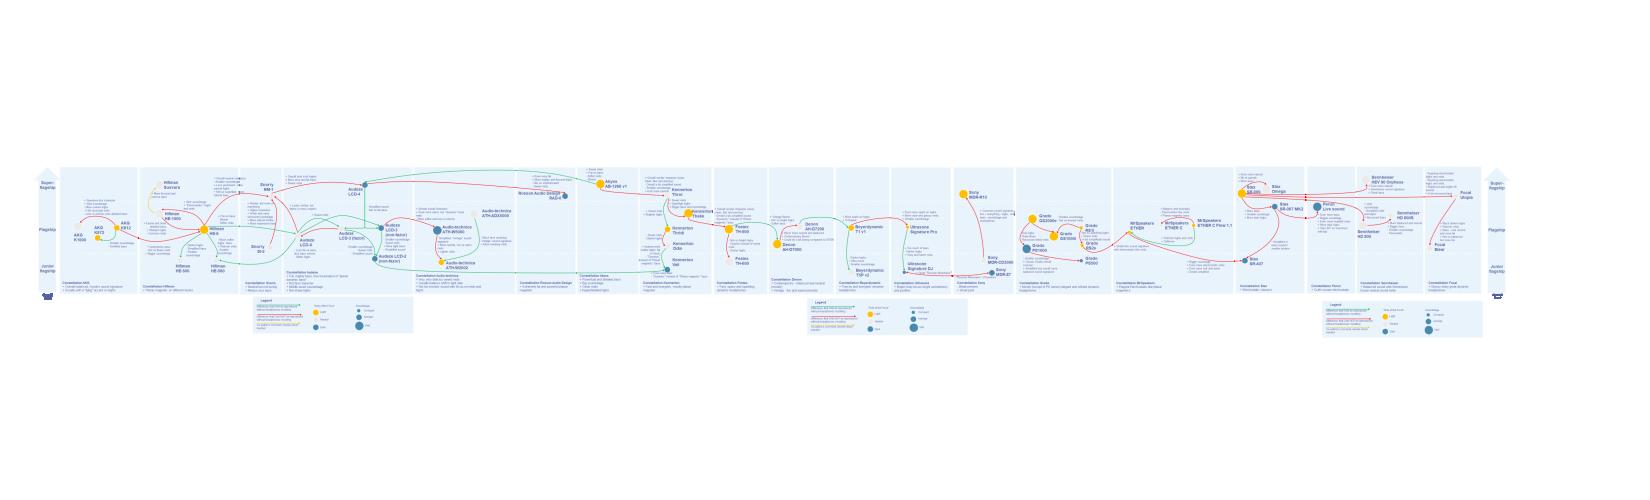 HP starmap 20210504.png